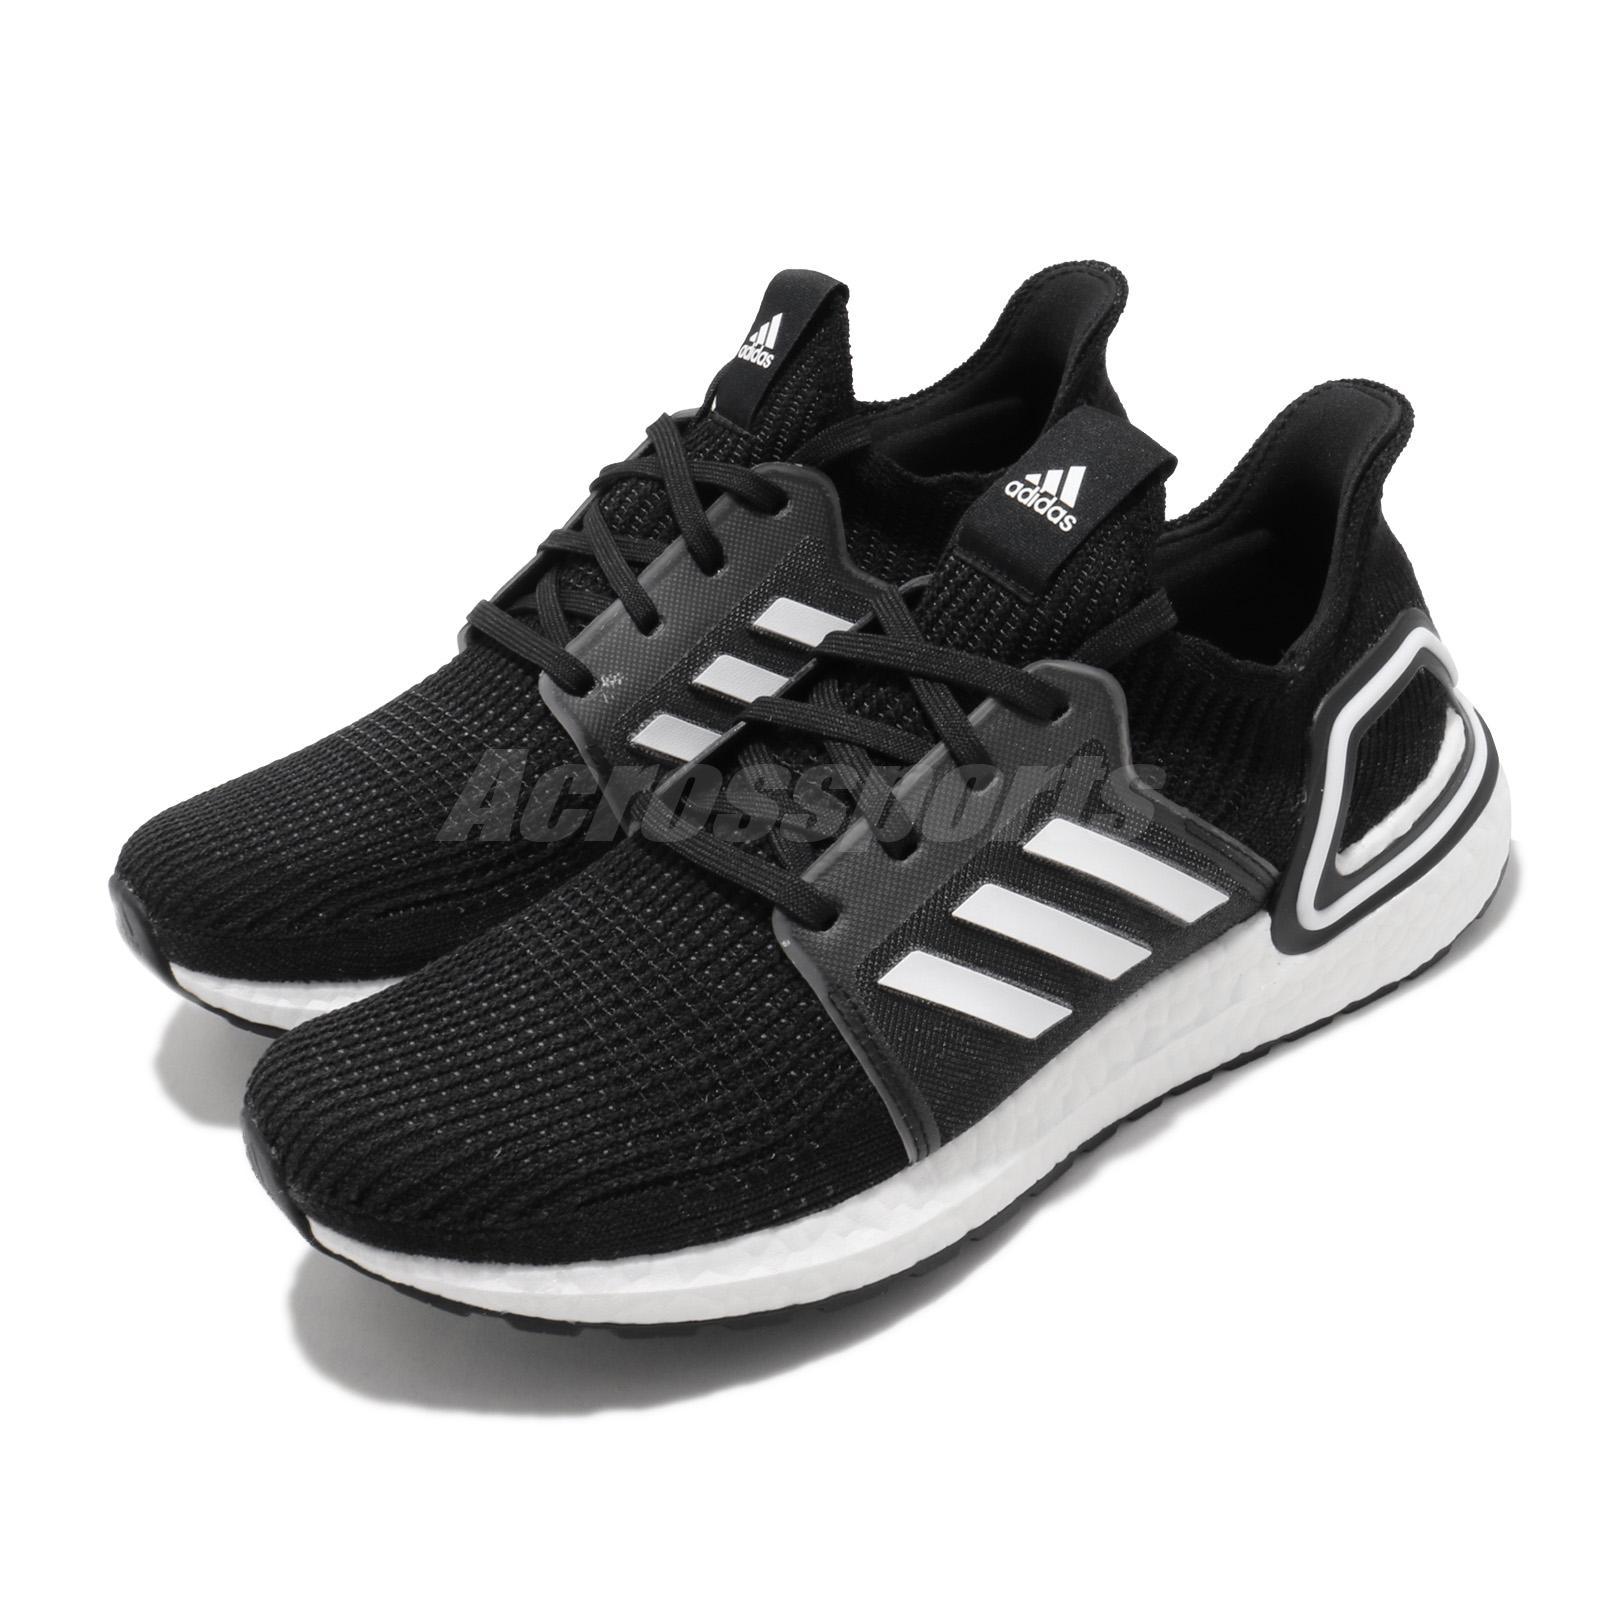 adidas UltraBOOST 19 U Black White Men